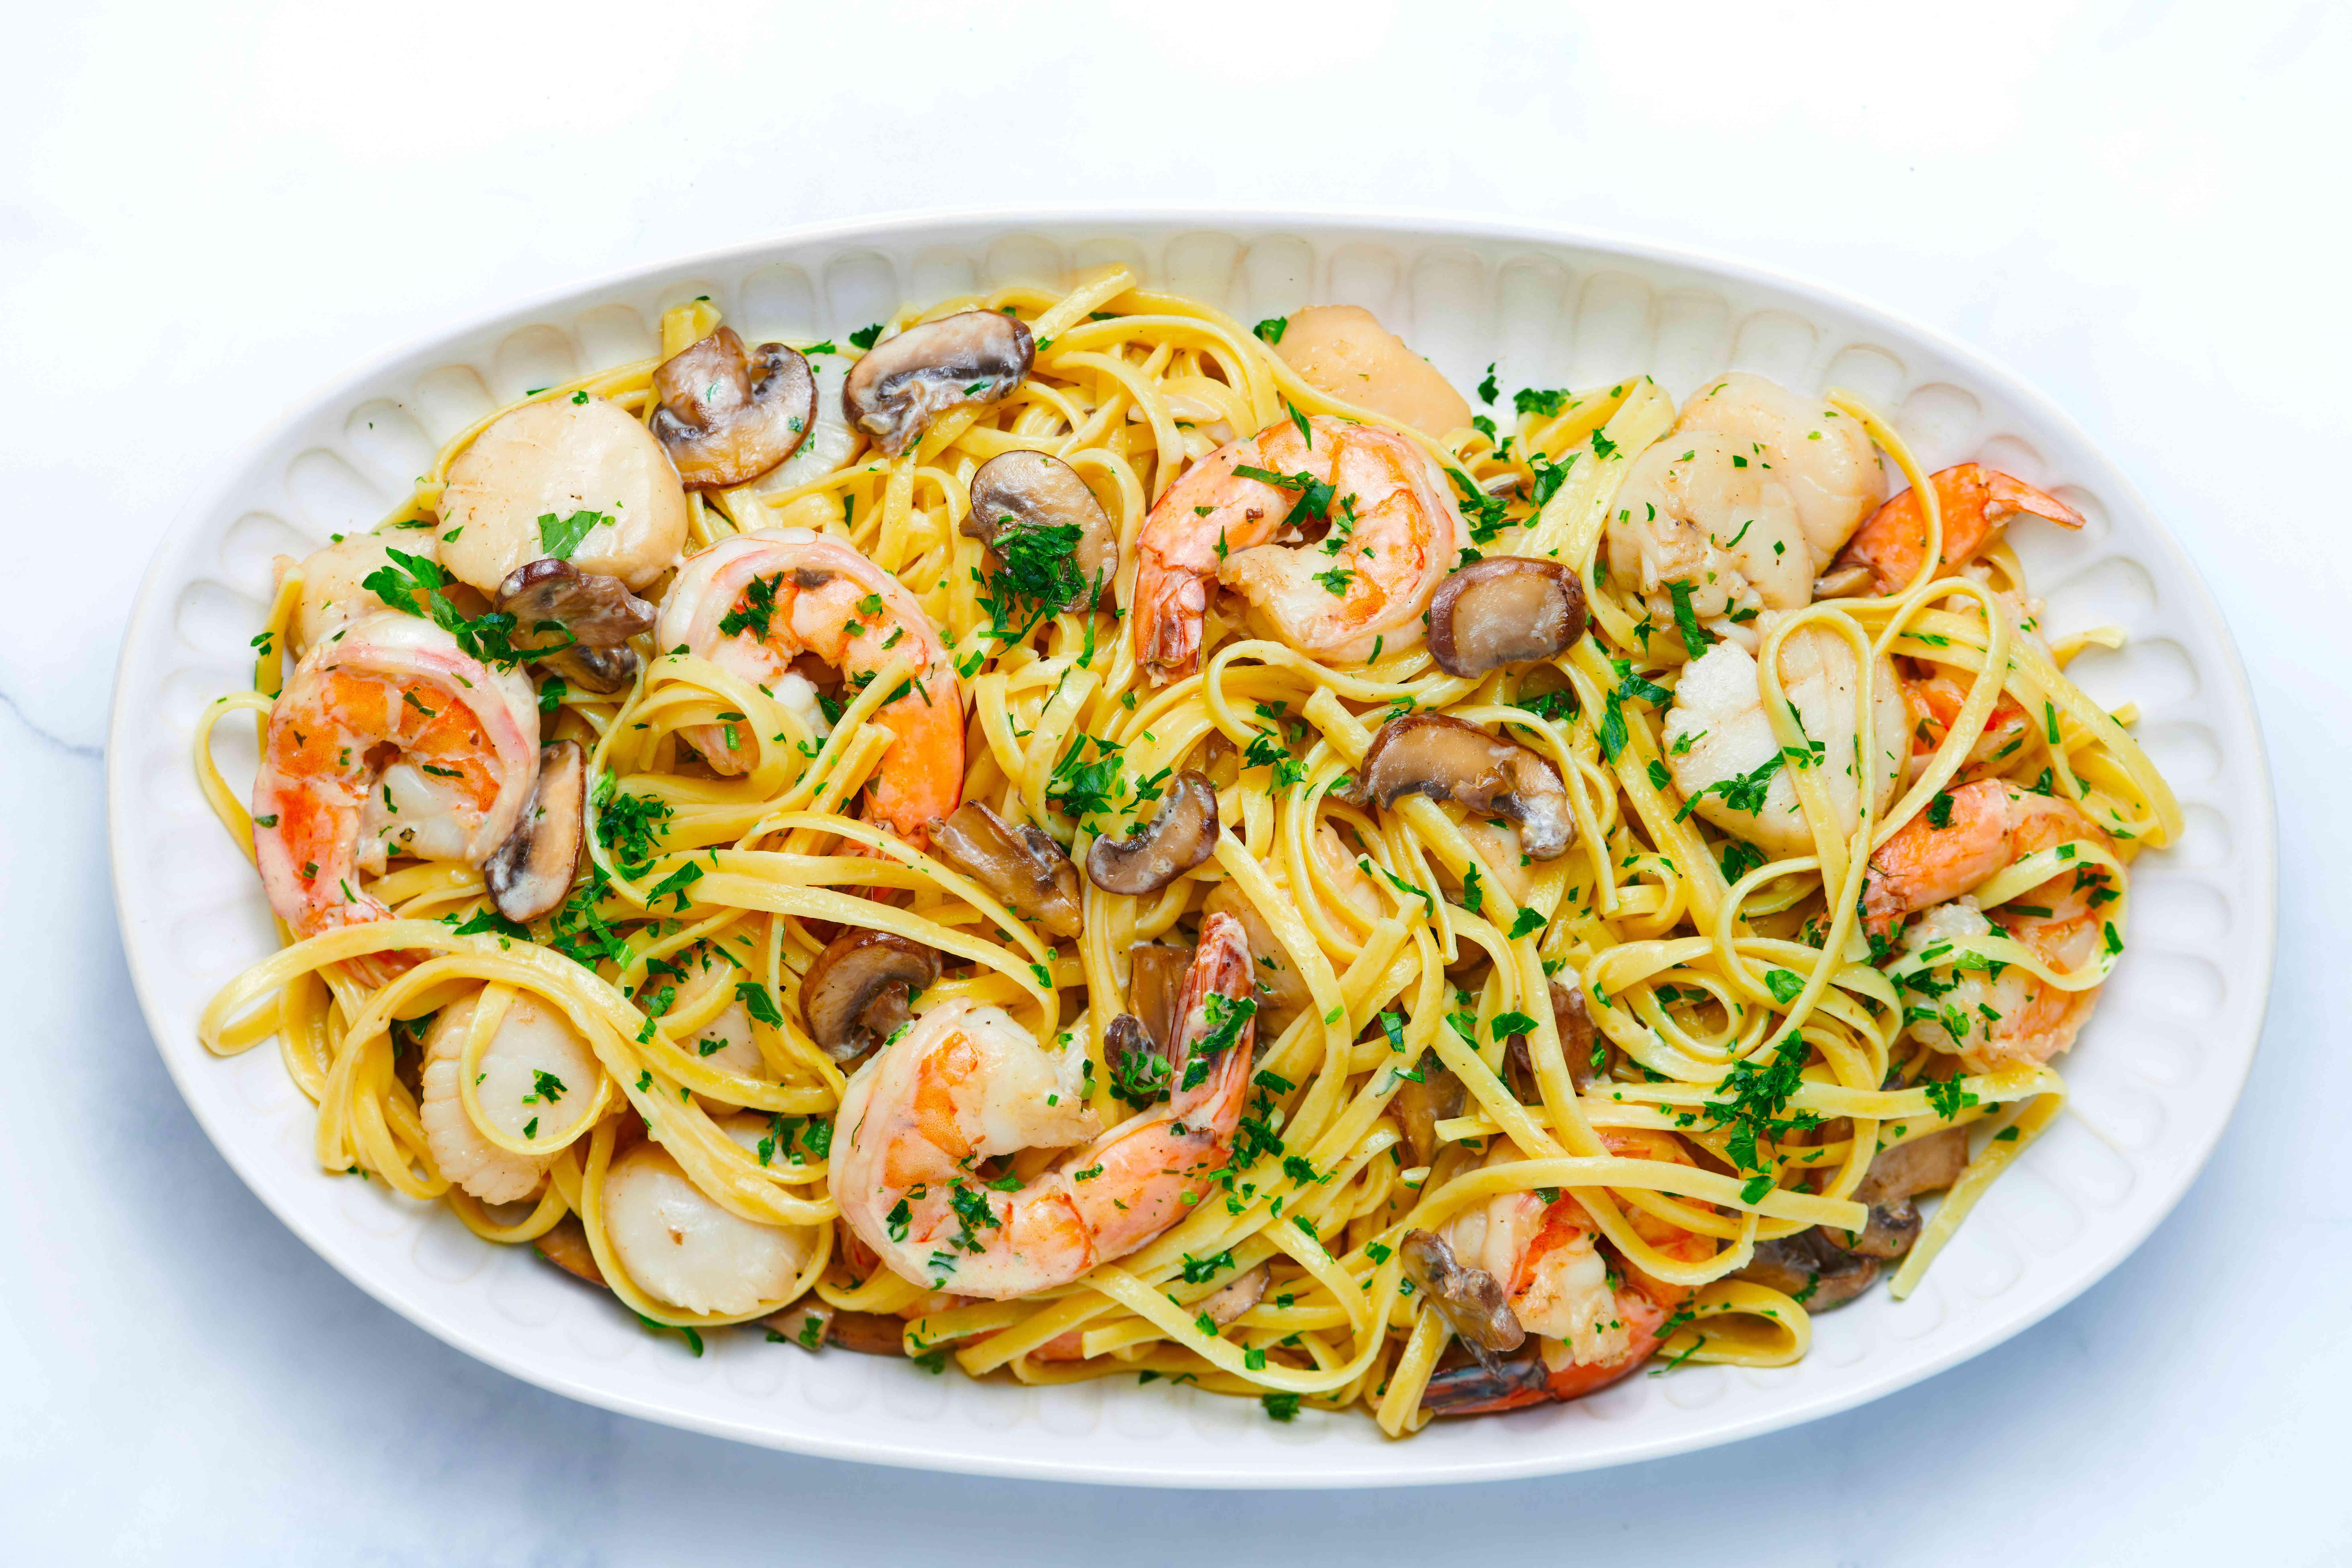 Seafood Pasta With Mushroom Cream Sauce on a platter